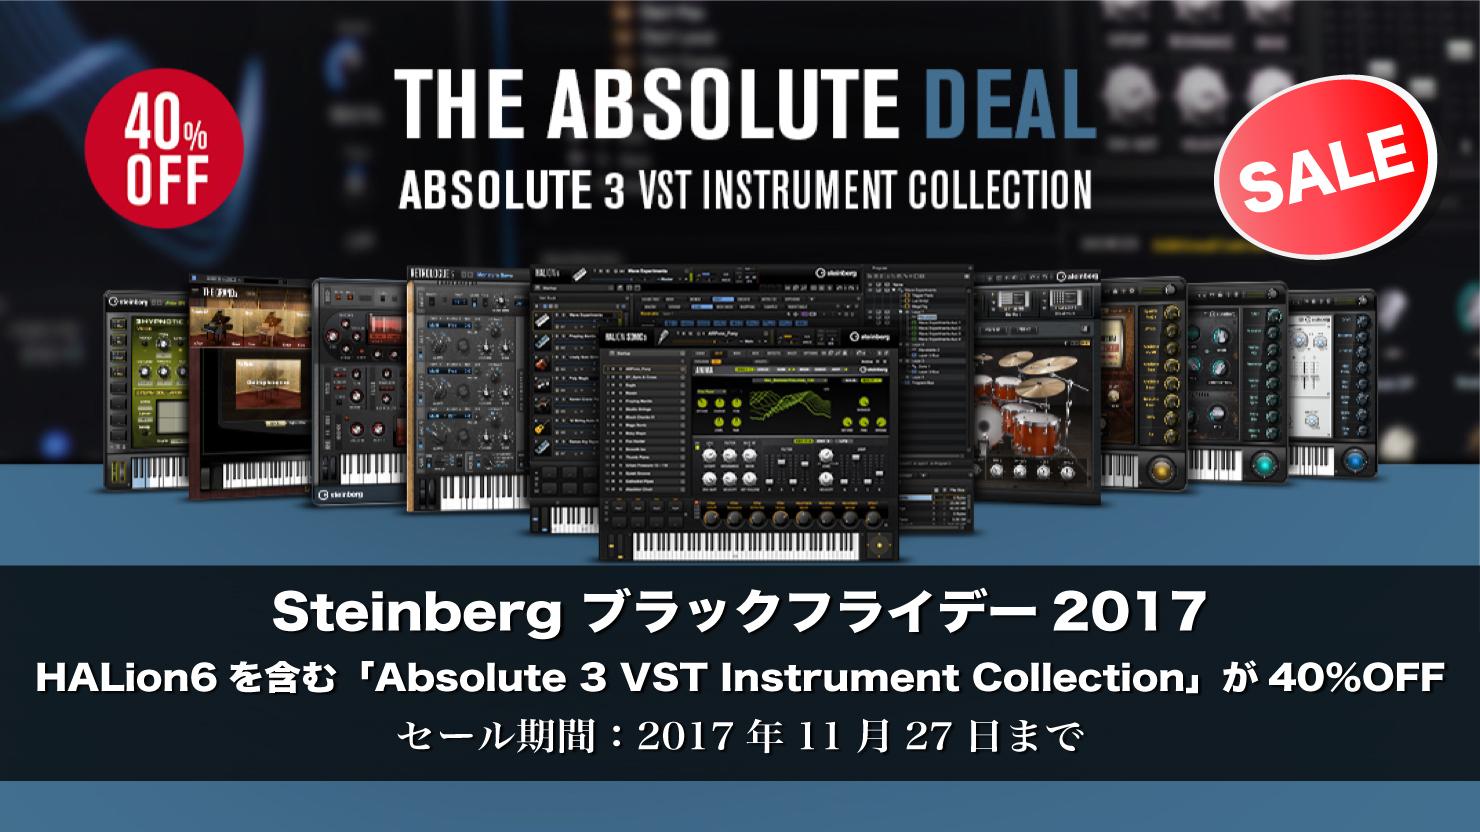 【40%OFF】Steinberg ブラックフライデー2017 HALion6を含む「Absolute 3 VST Instrument Collection」がセール中!